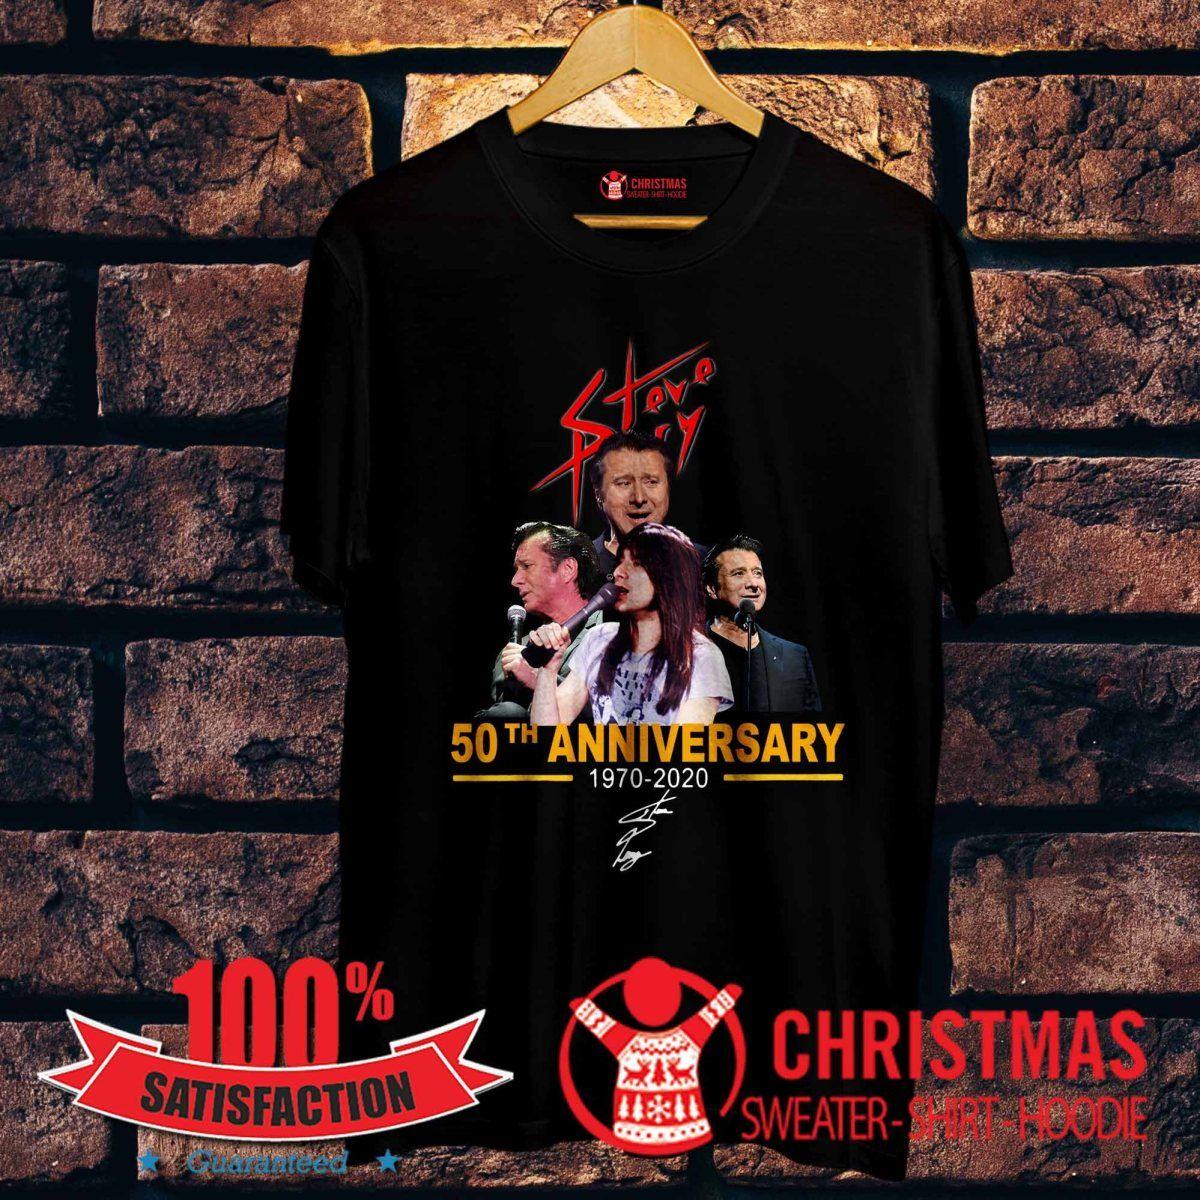 Steve Perry Christmas 2020 Steve Perry 50th anniversary 1970 2020 shirt | Steve perry, 50th